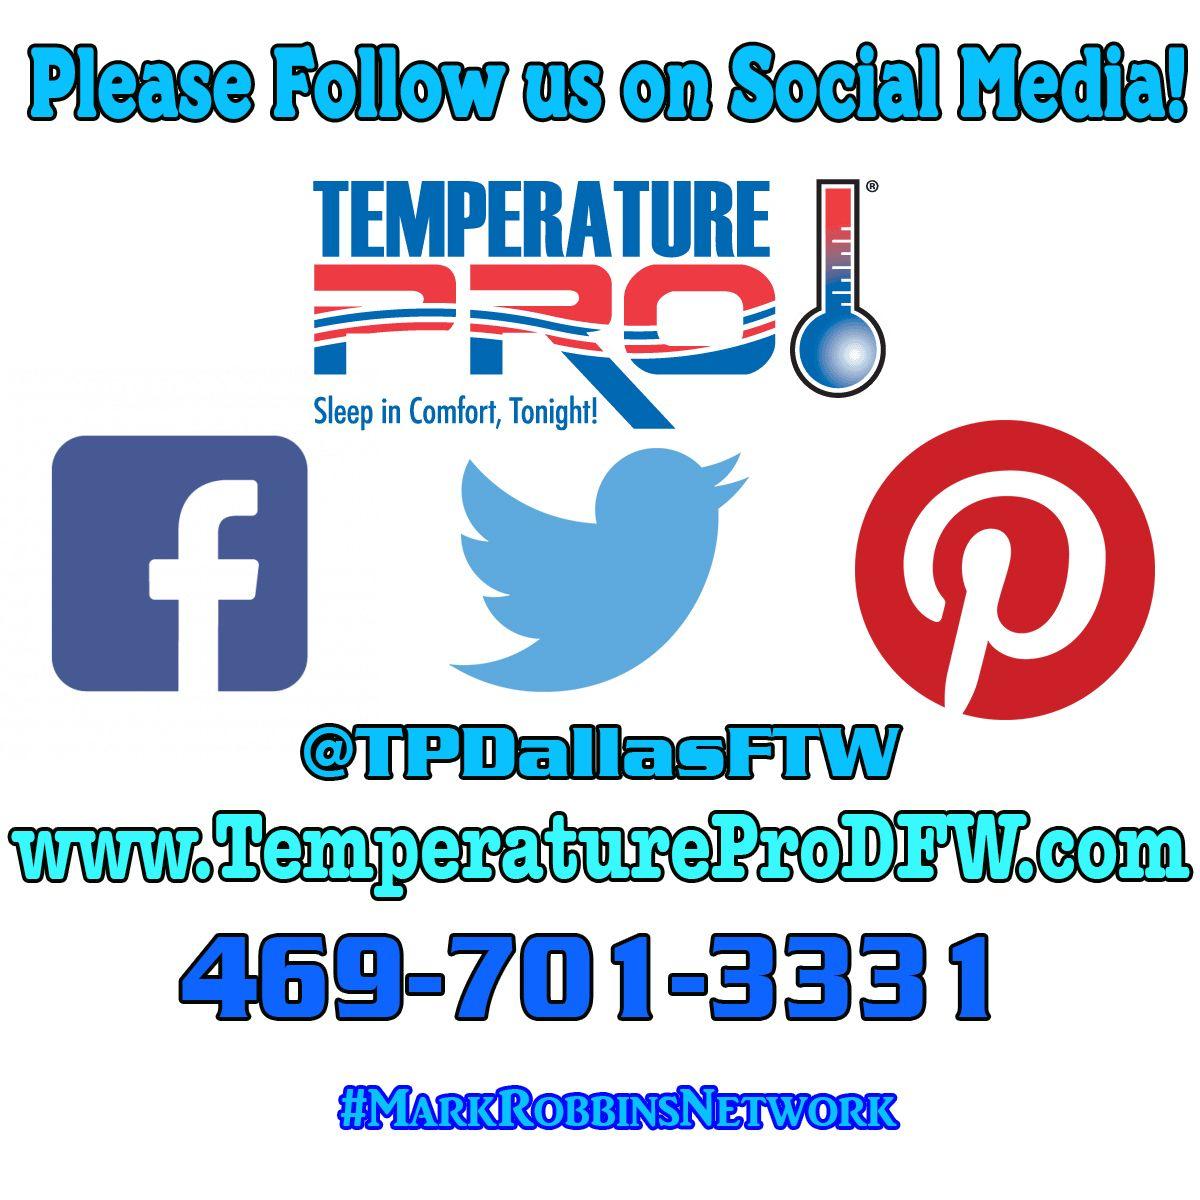 Please follow us on Social Media, we do follow back! We